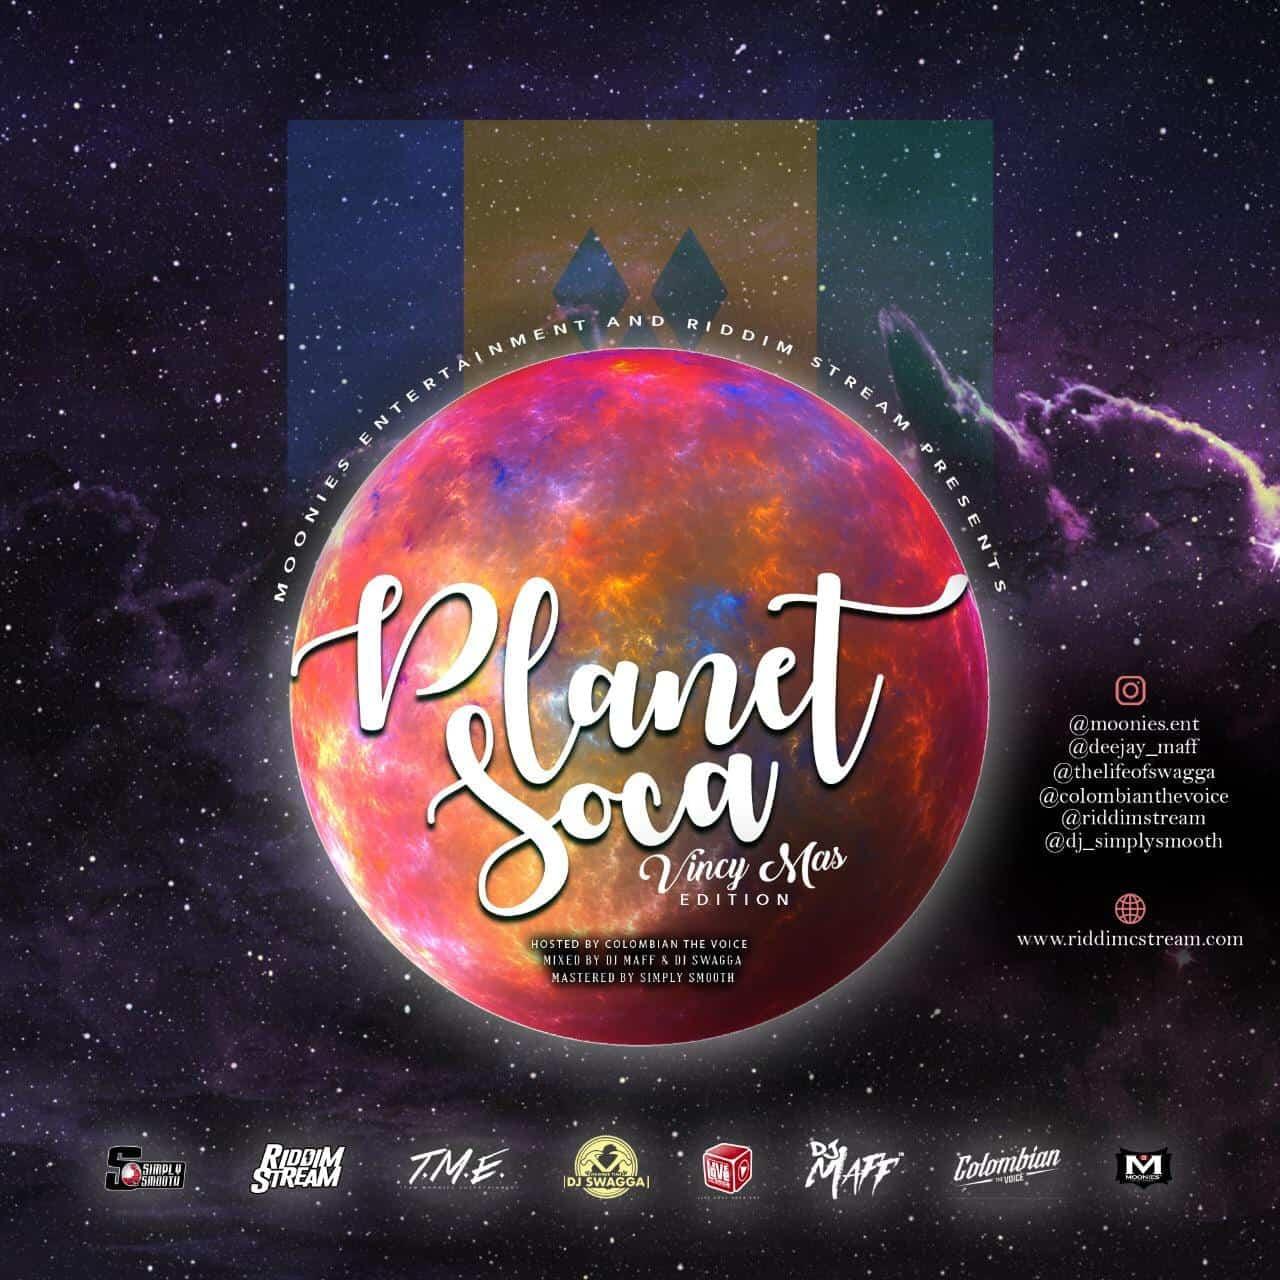 Planet Soca Mix 2019 - Vincy Mas Edition